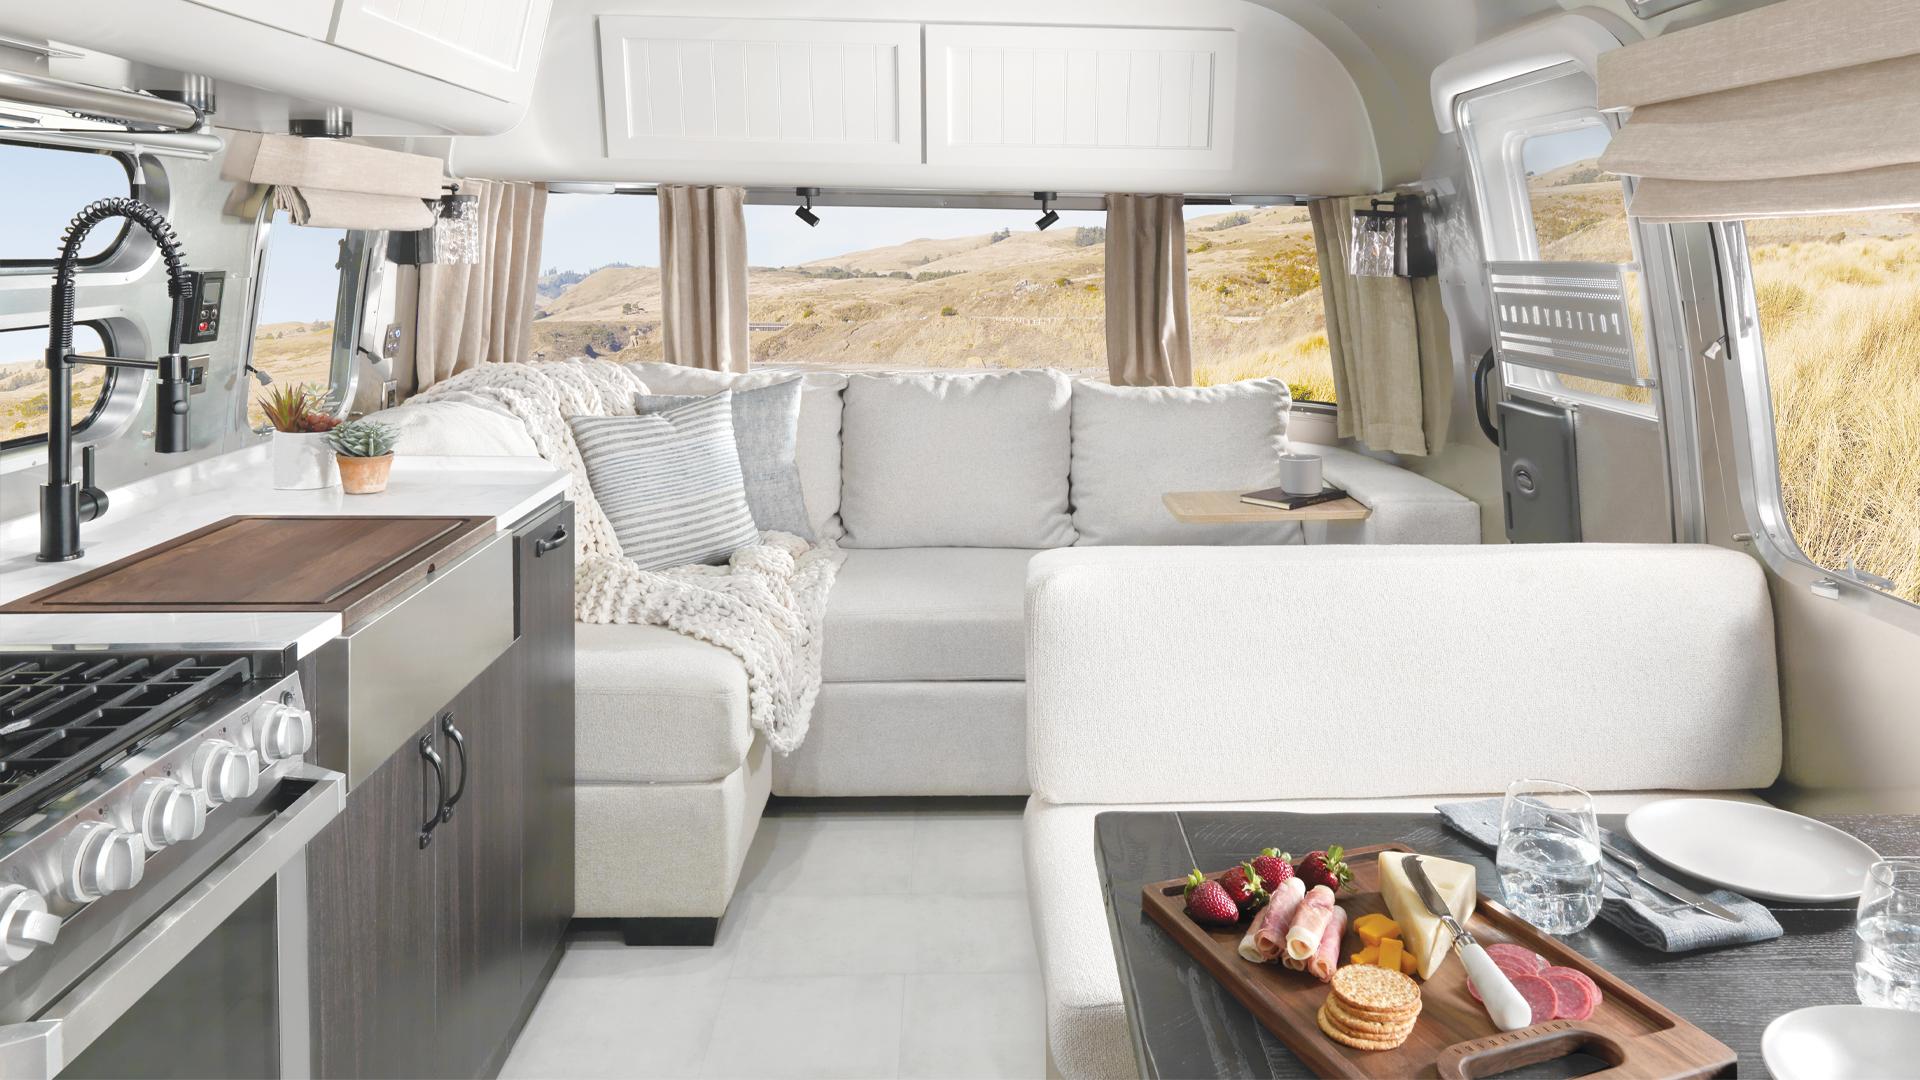 Airstream-X-Pottery-Barn-Interior-Galley